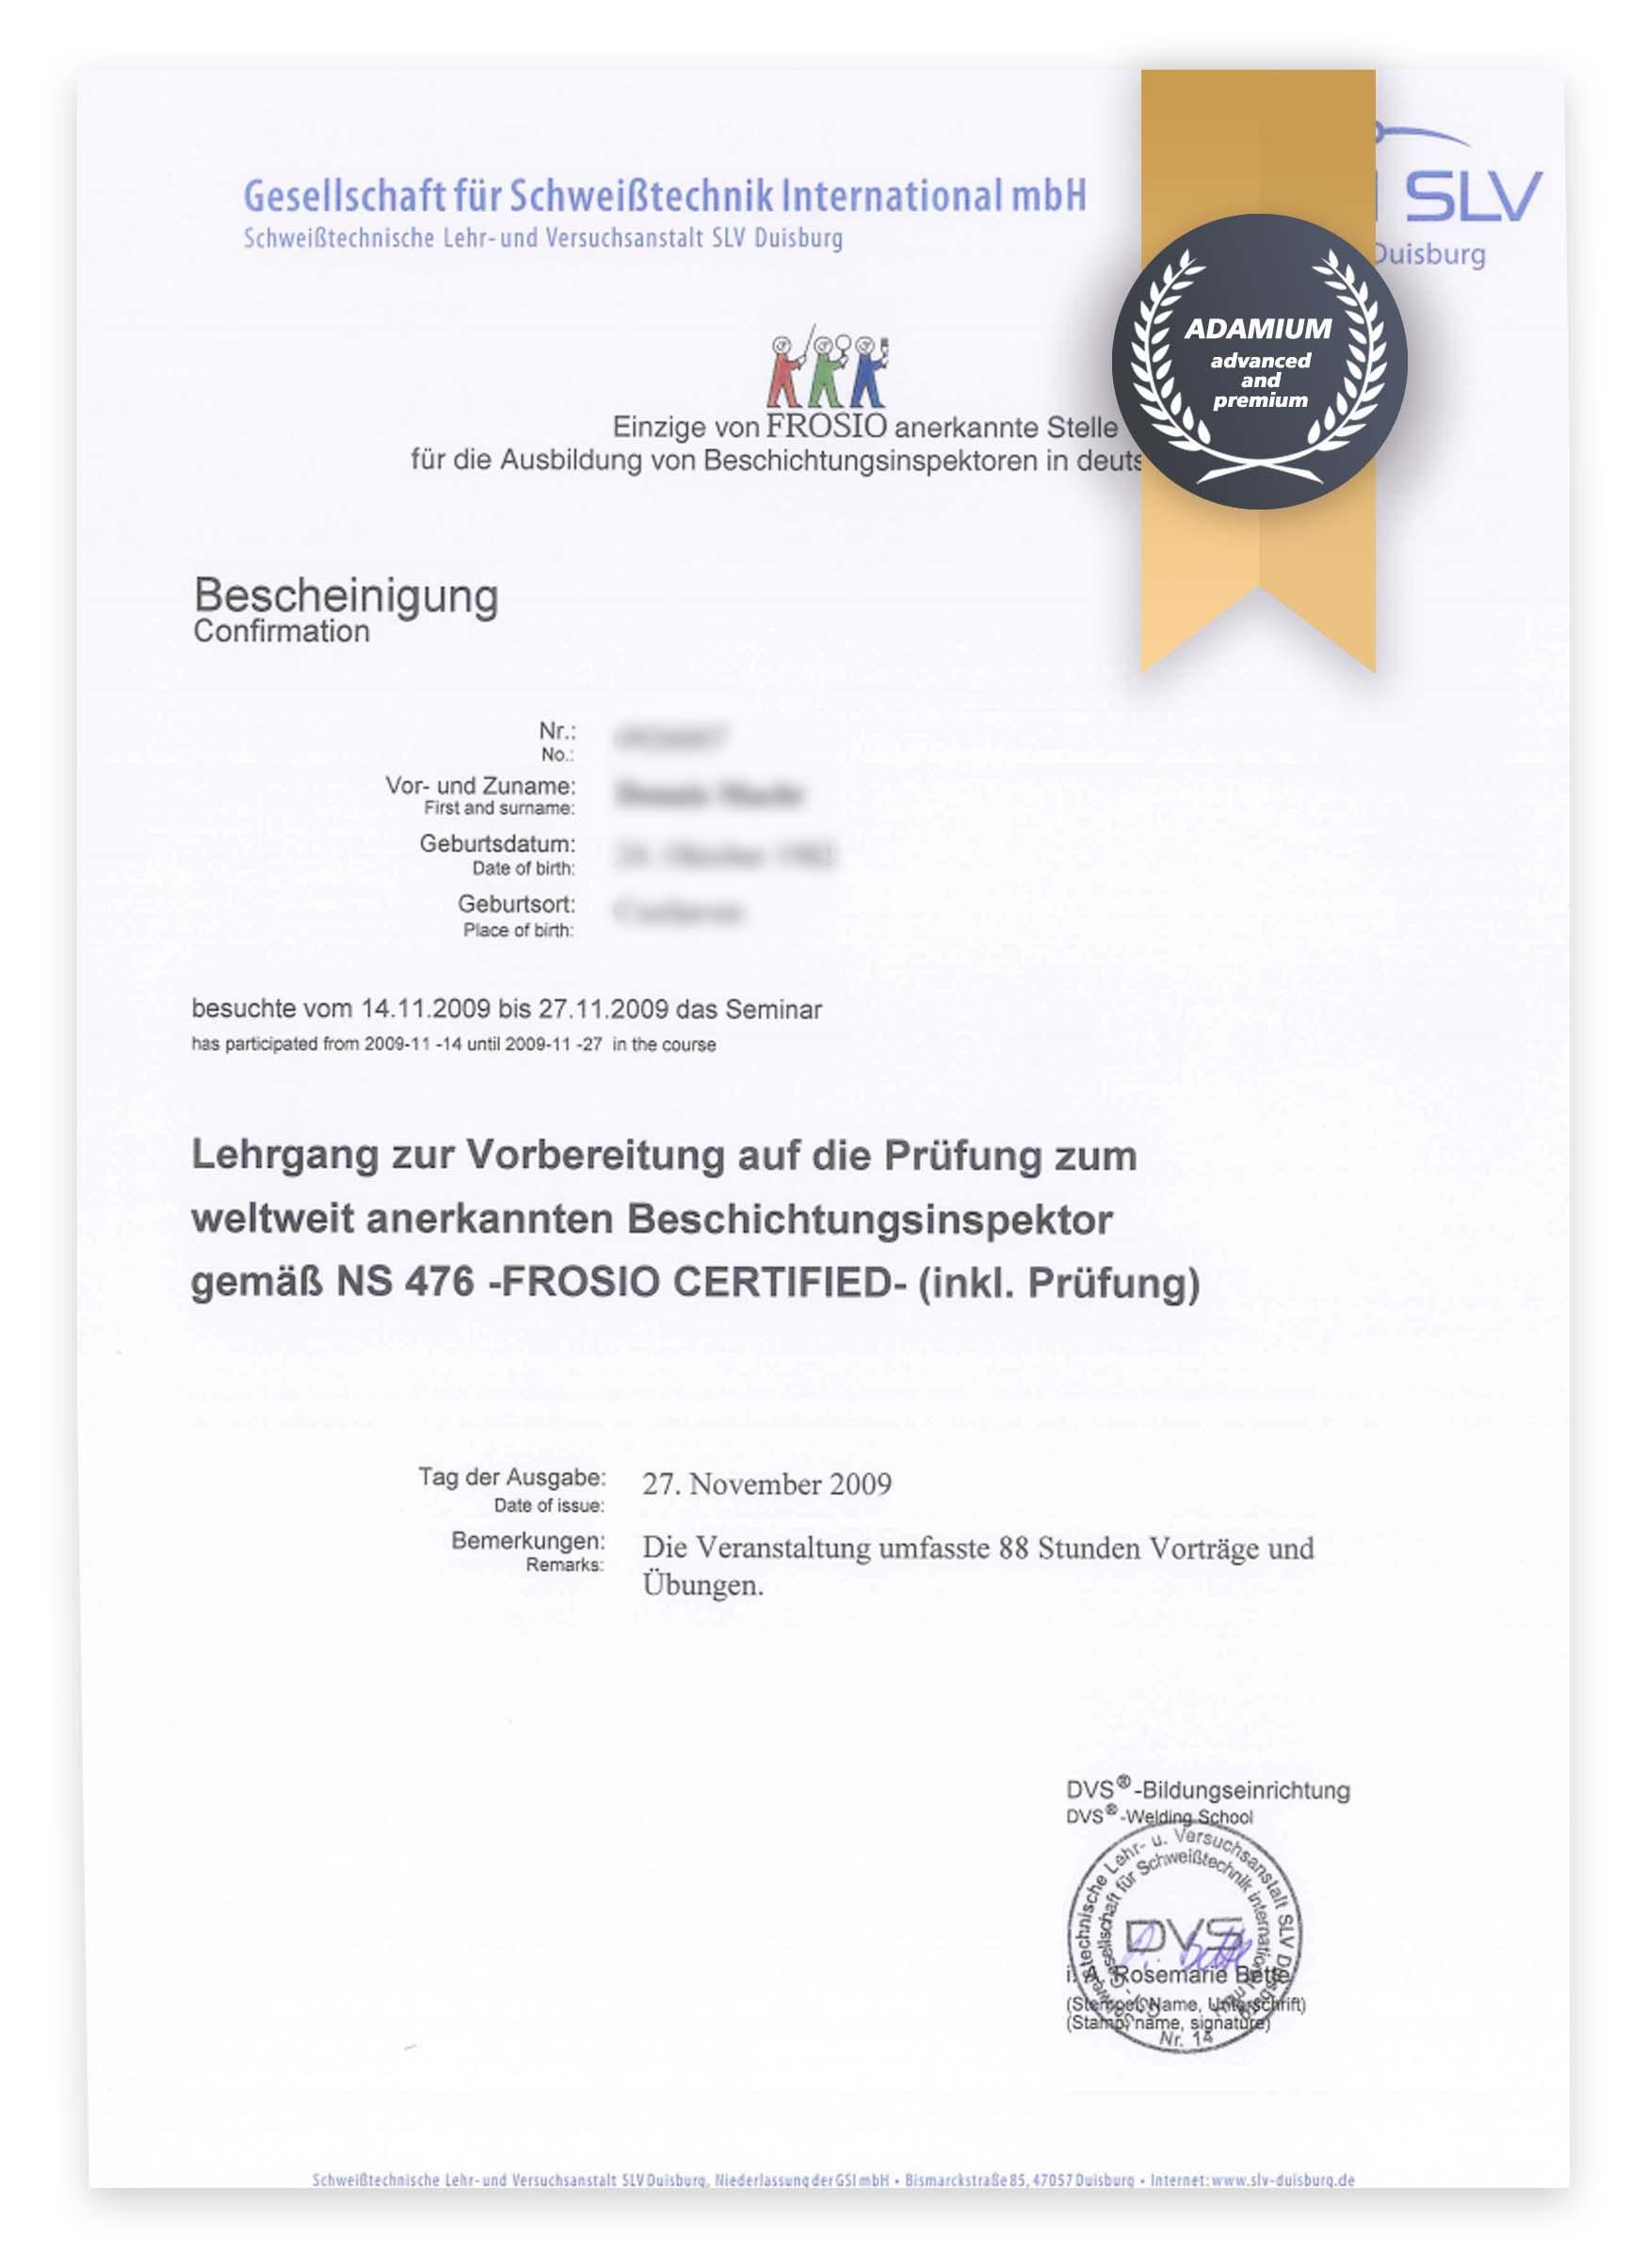 zertifikat2_1.jpg